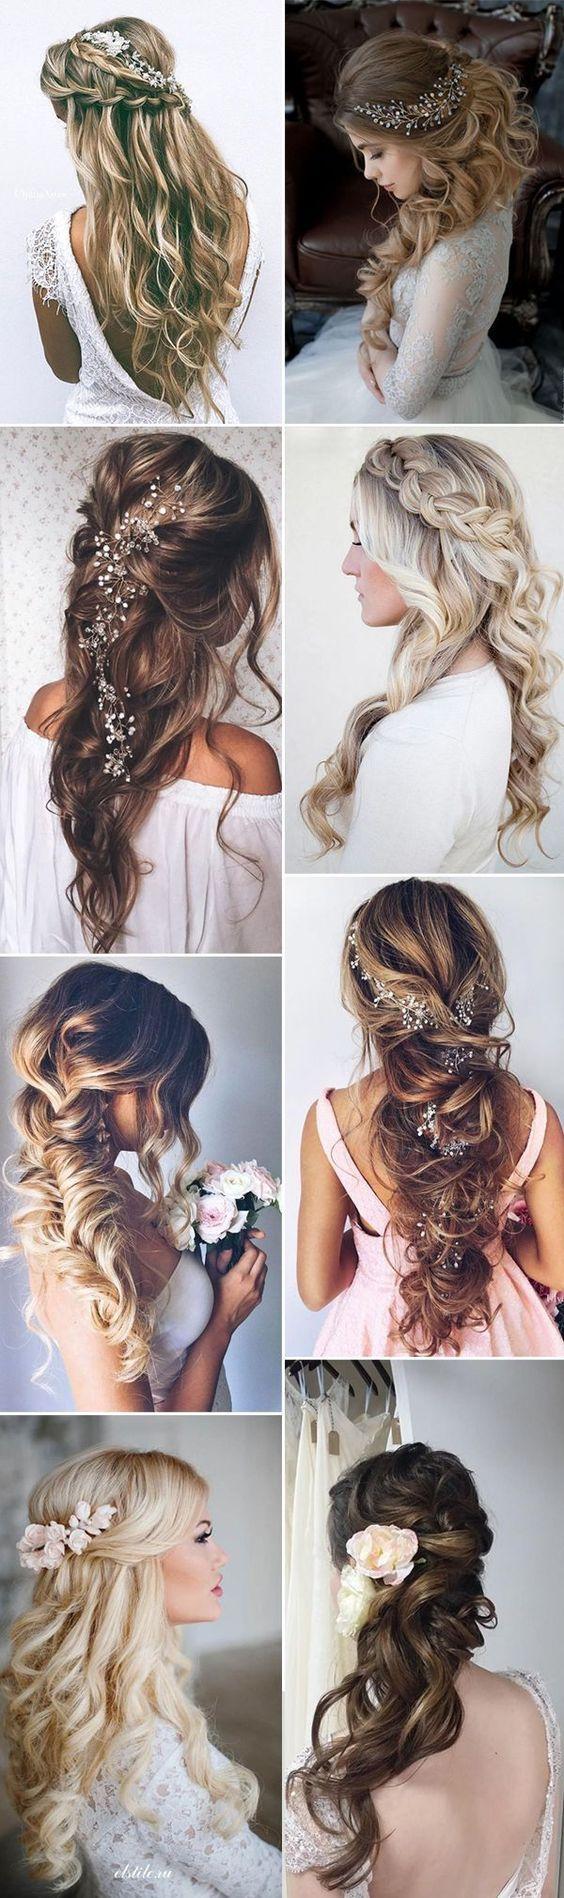 27 ideas de peinados para xv años | long hairstyle, weddings and